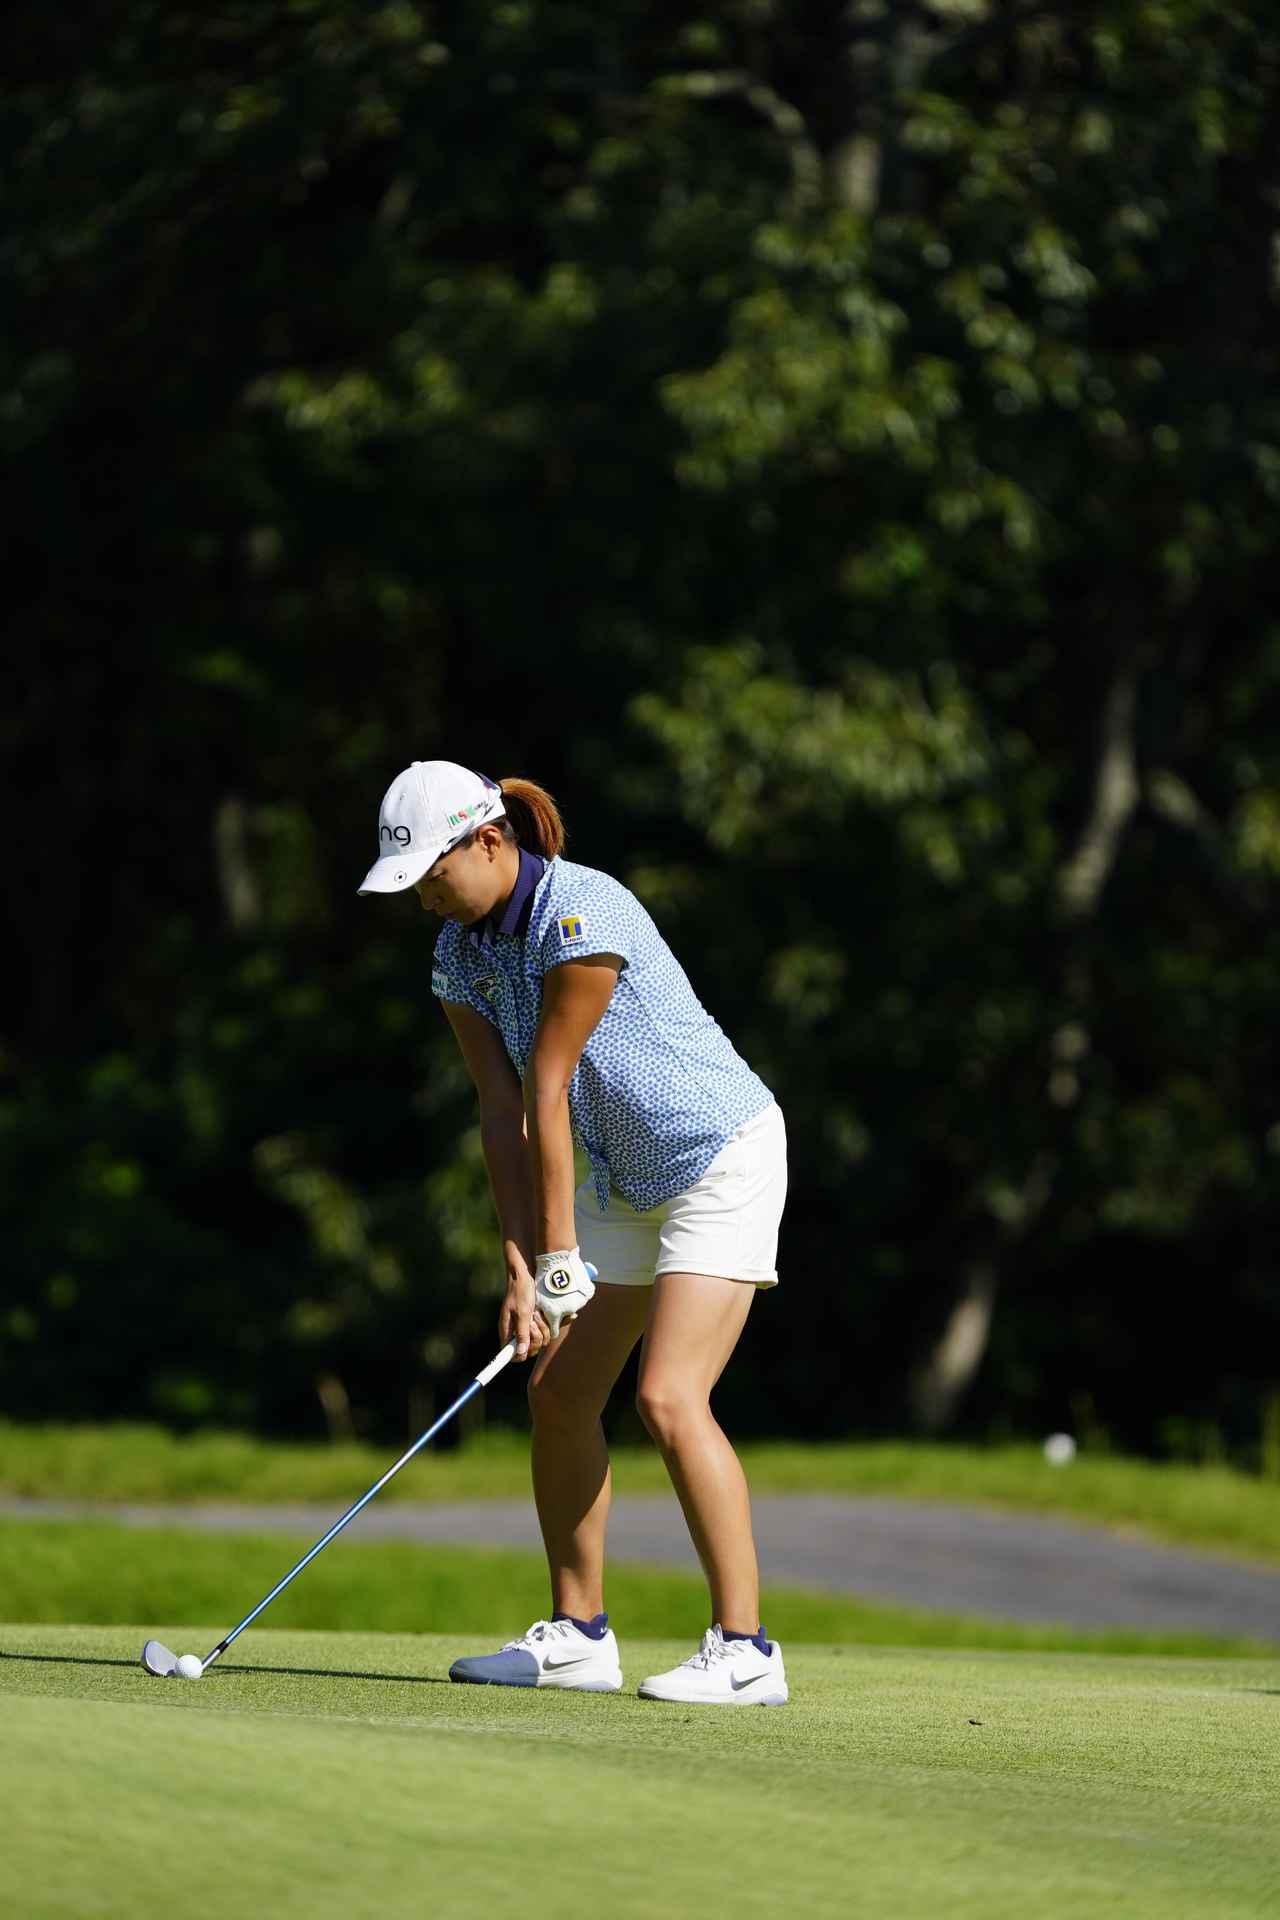 Images : 1番目の画像 - 渋野日向子 アイアン連続写真 - みんなのゴルフダイジェスト